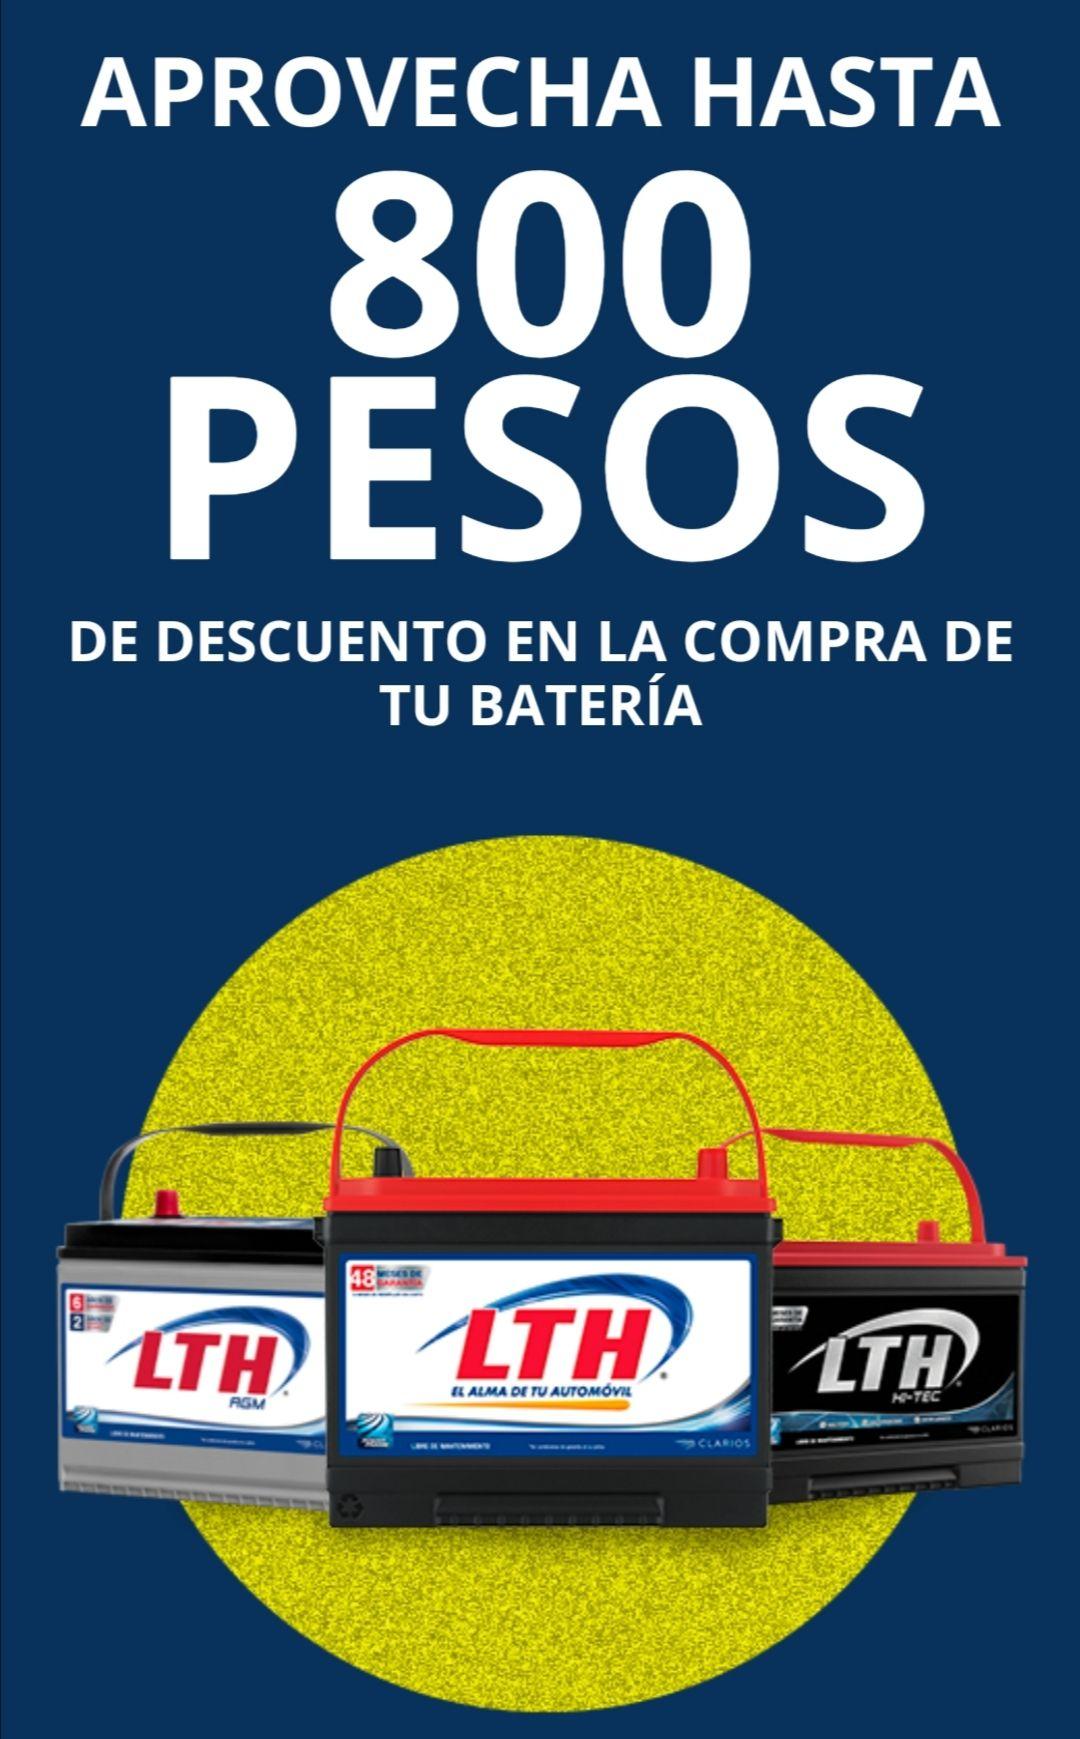 LTH: Descuento de hasta $800 baterías LTH